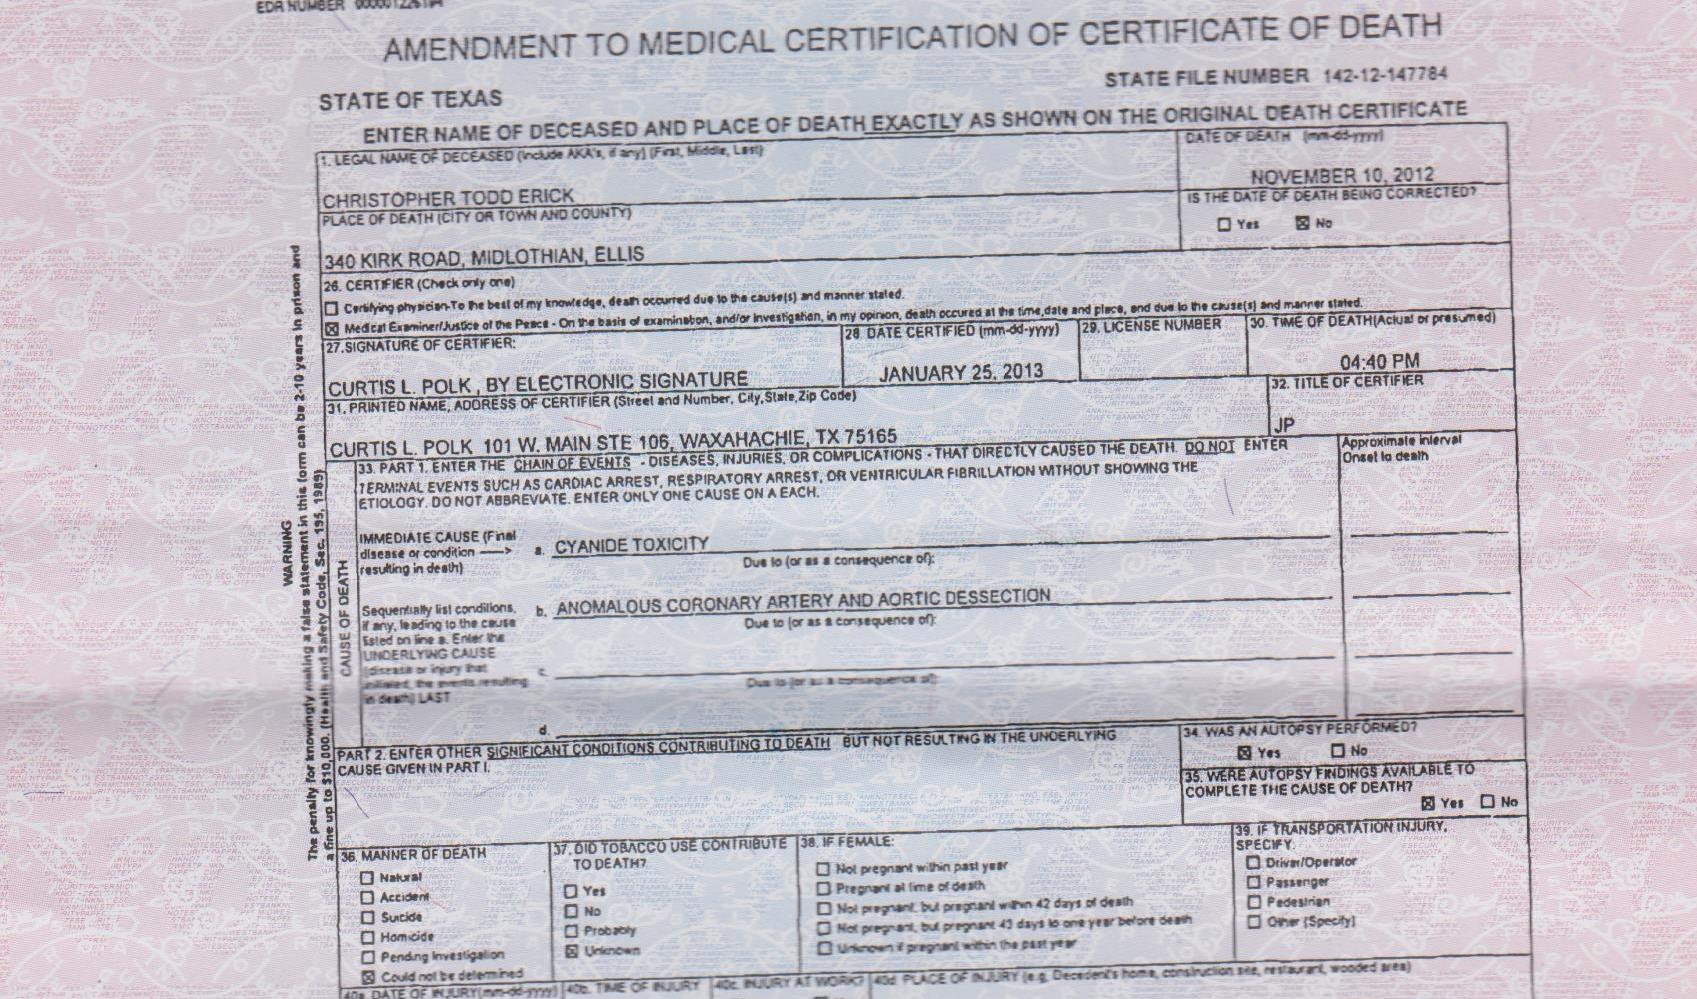 Murder mystery in midlothian texas crime scene photos death certificate xflitez Choice Image